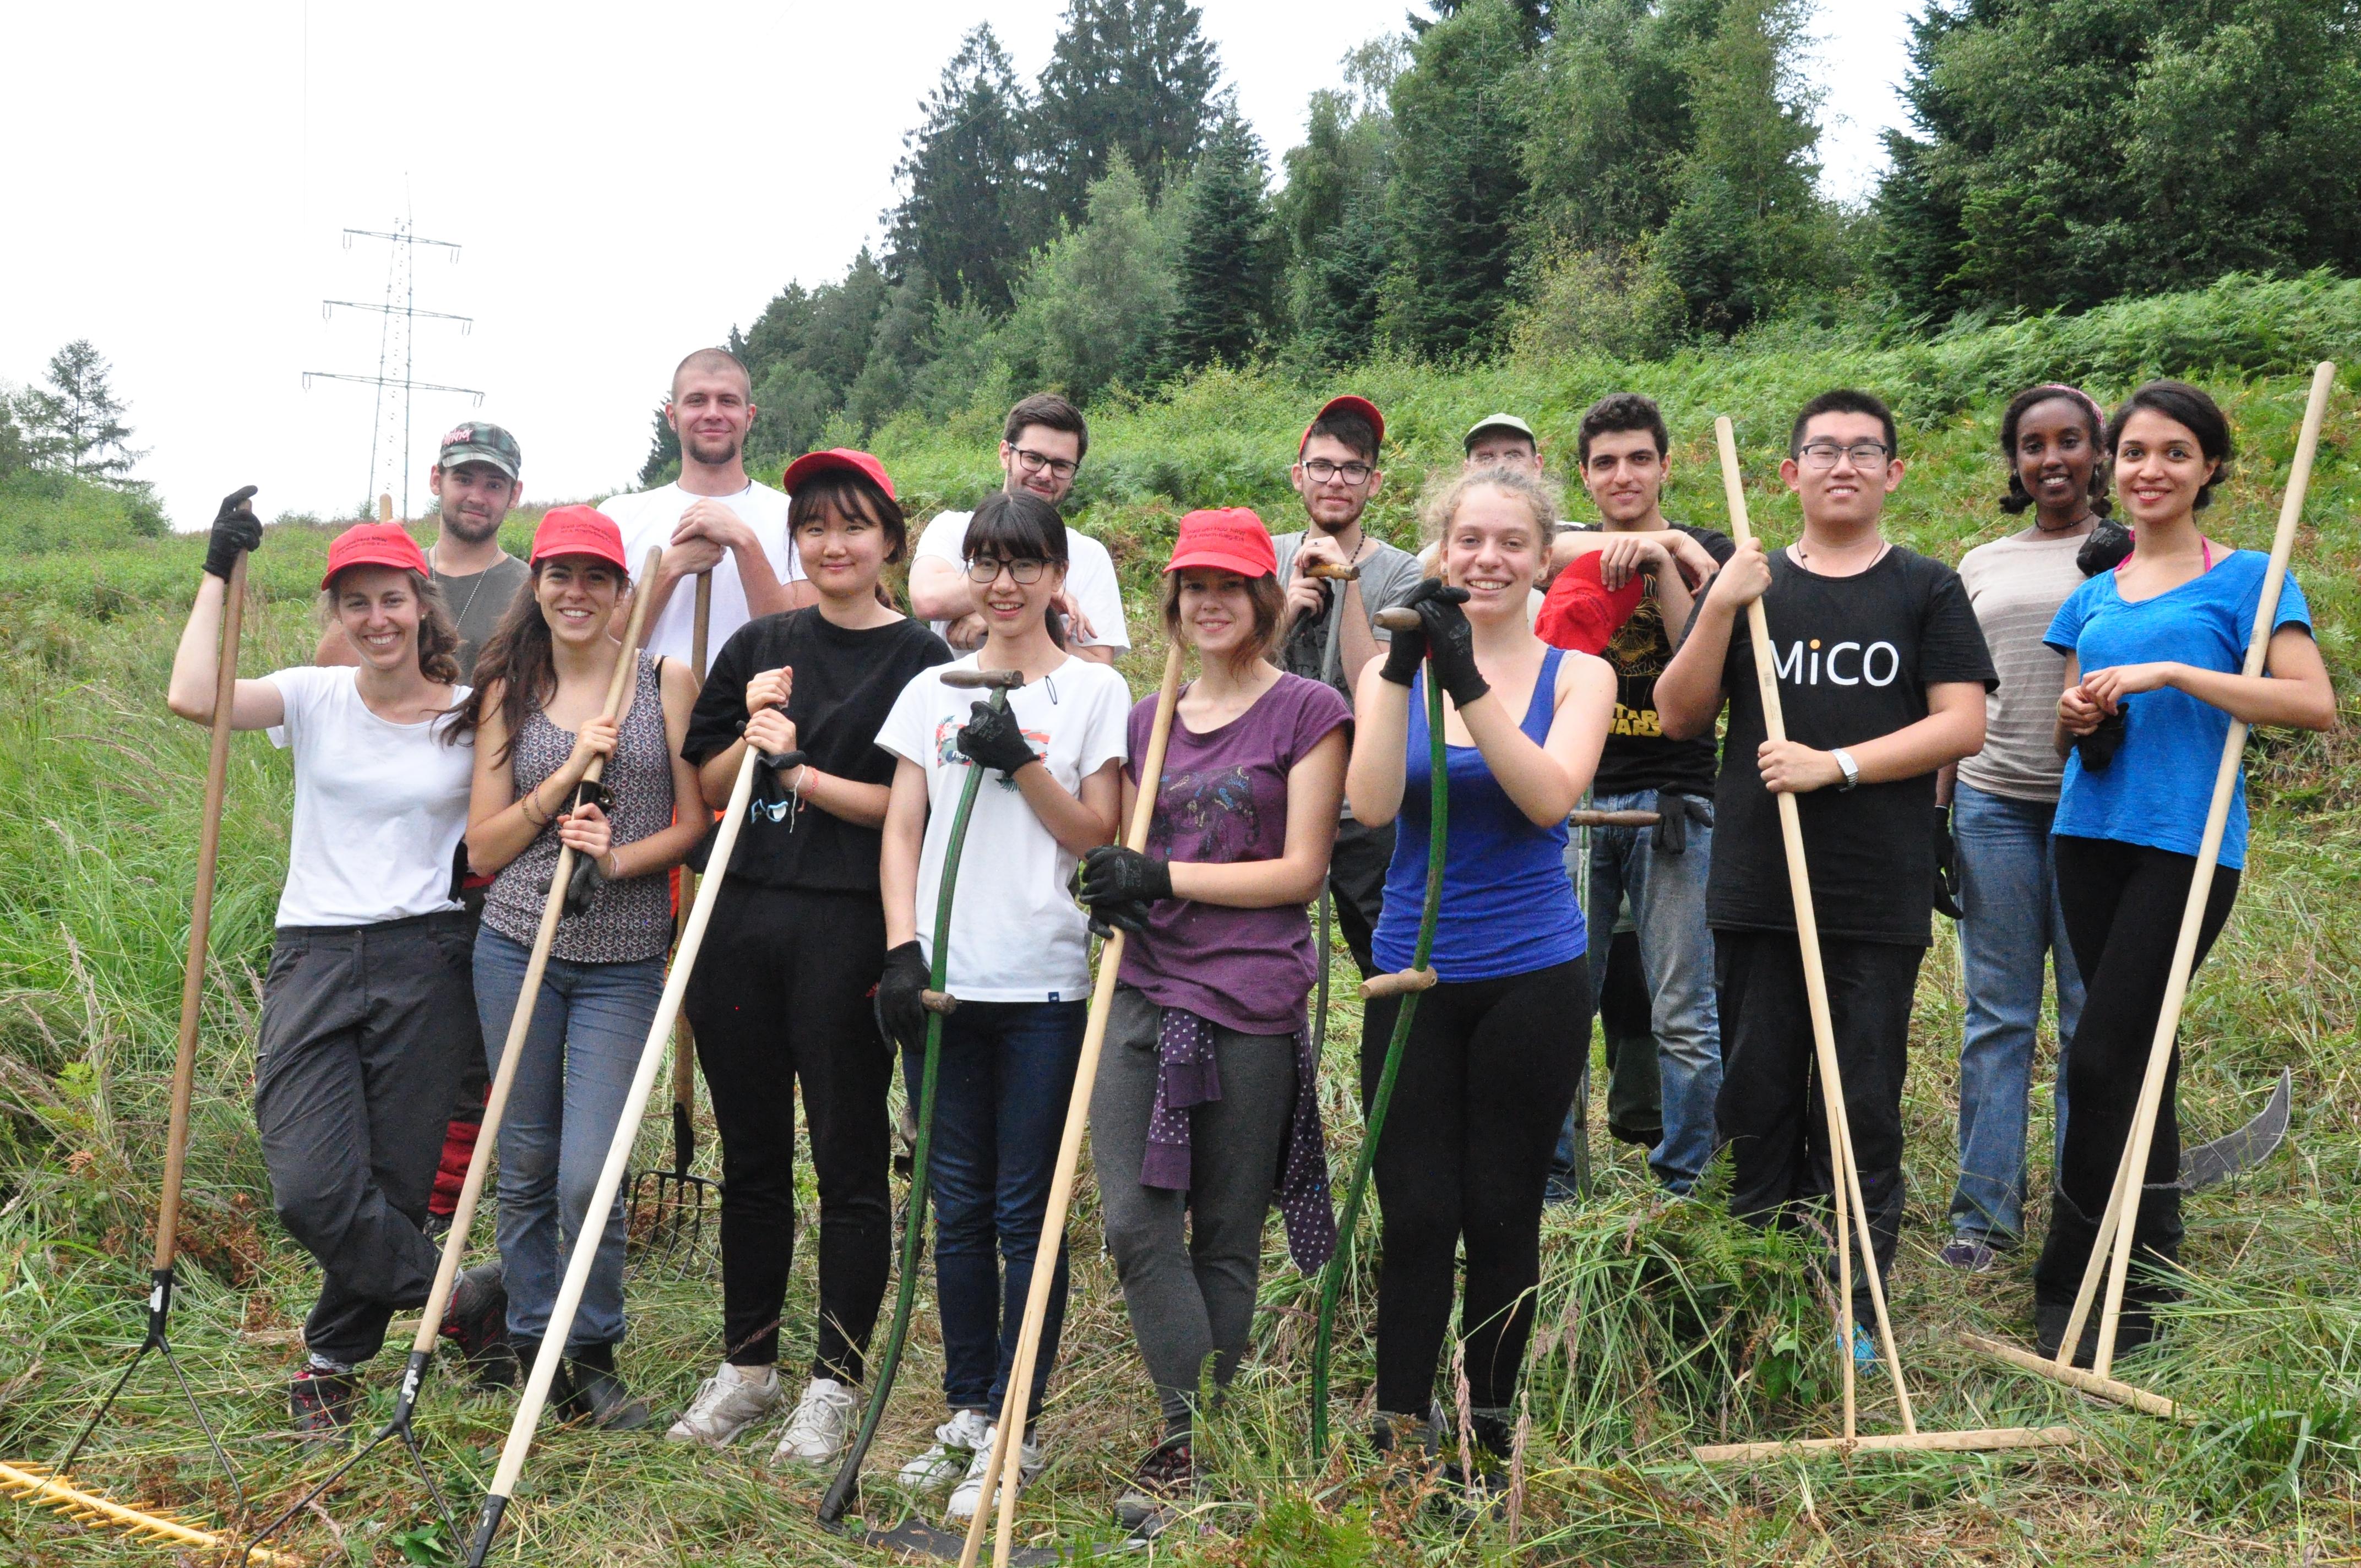 Naturschutzprojekt Schlingnatterschutz mit internationalem Jugendworkcamp